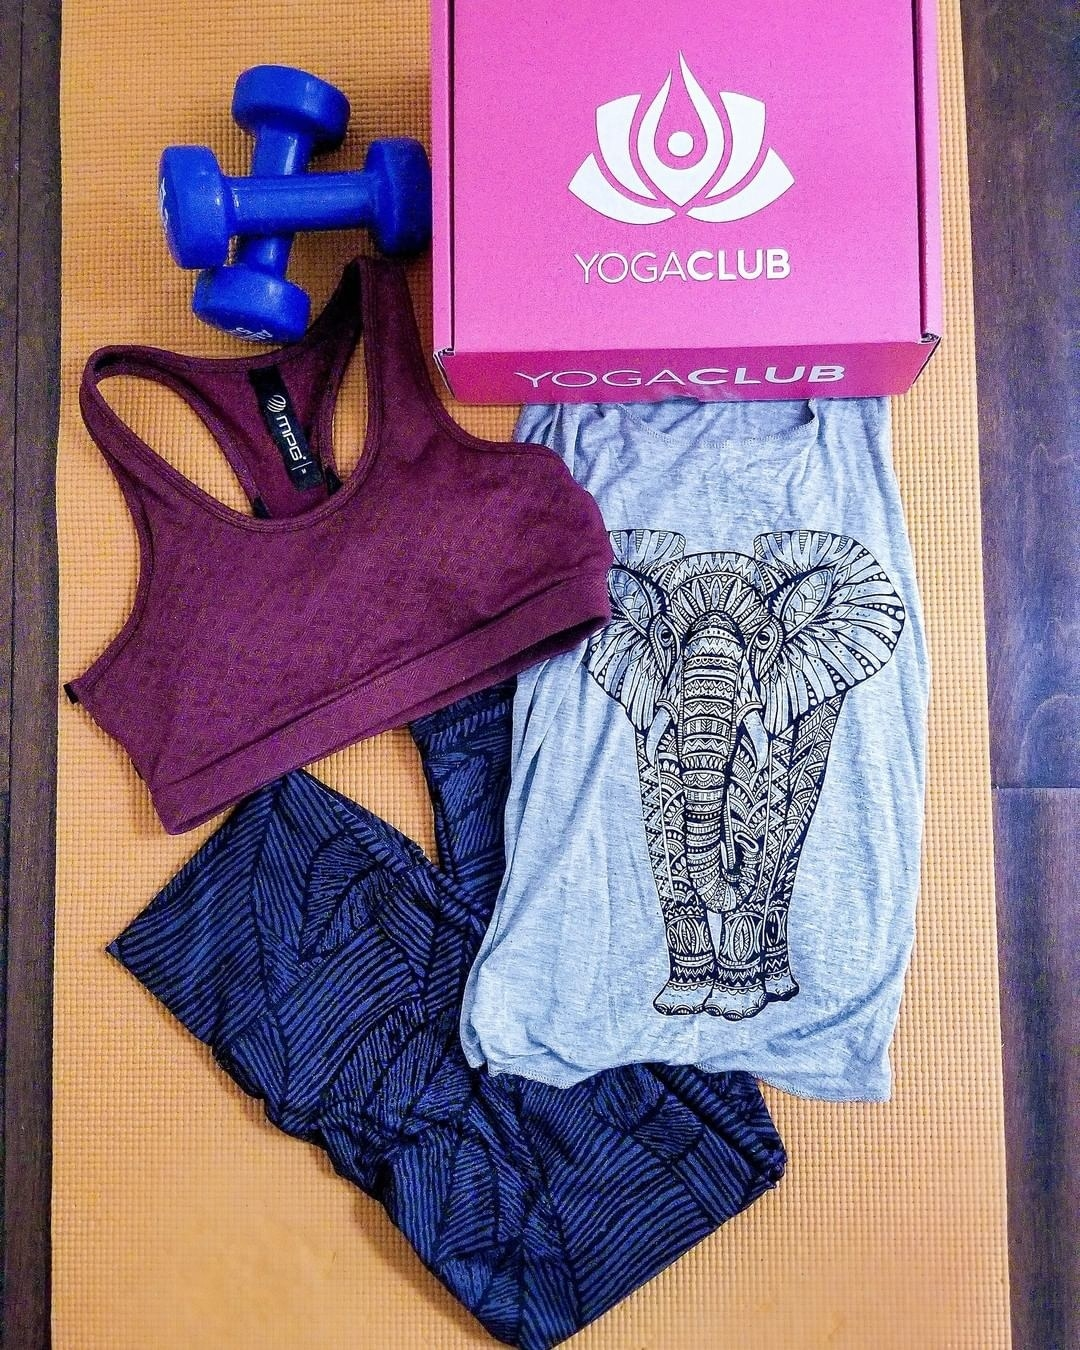 YogaClub pink box with magenta sports bra, black and dark blue print-leggings, and light blue top with elephant design